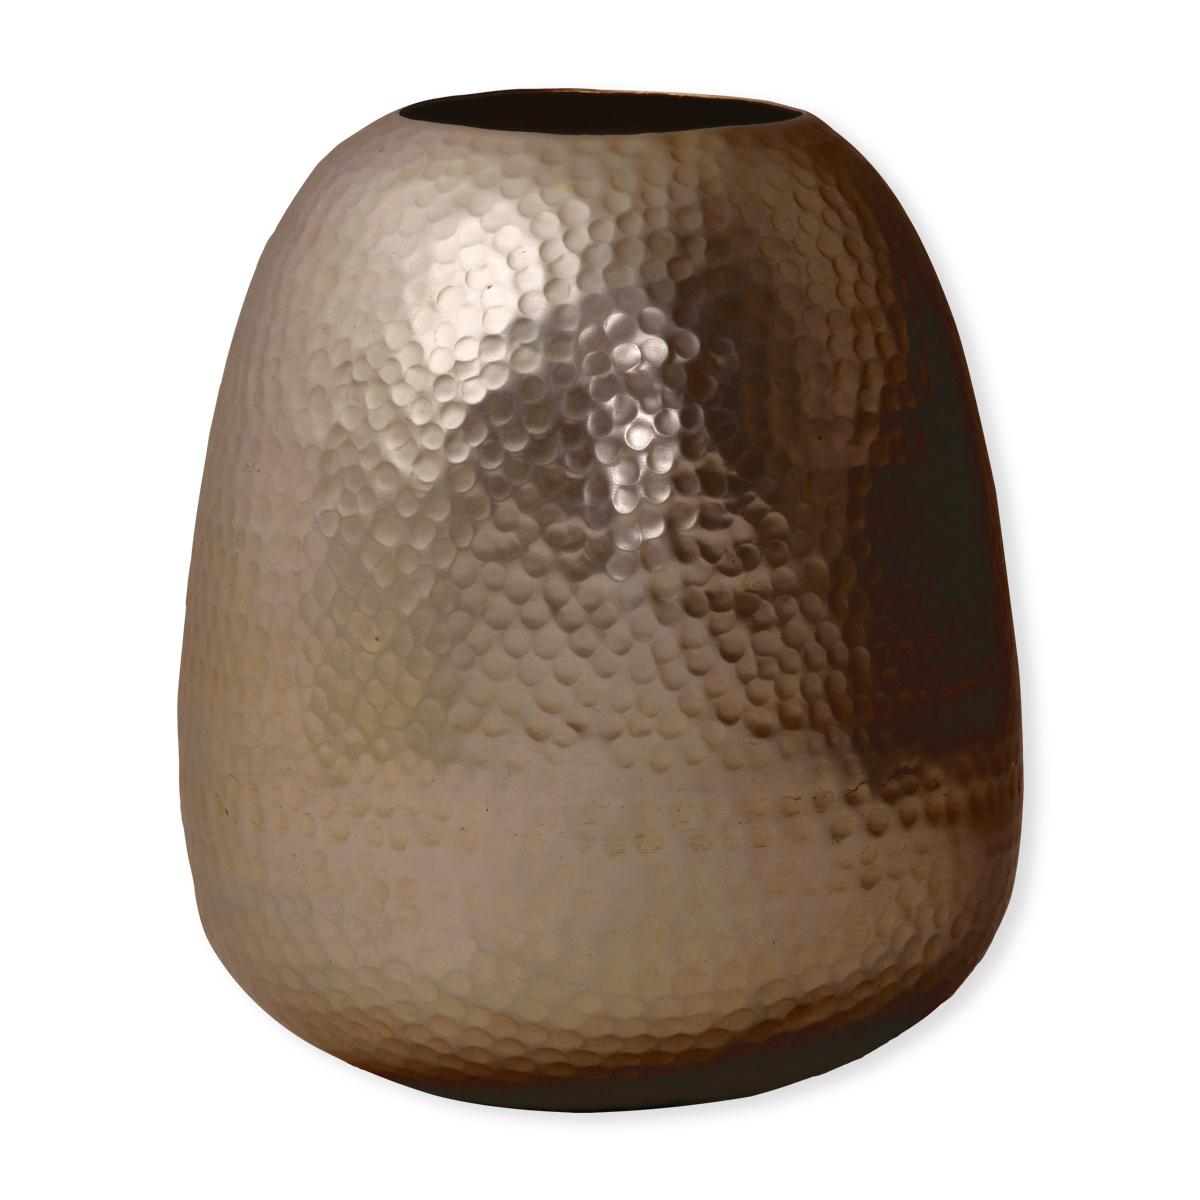 grand vase design en aluminium couleur bronze bruno evrard. Black Bedroom Furniture Sets. Home Design Ideas